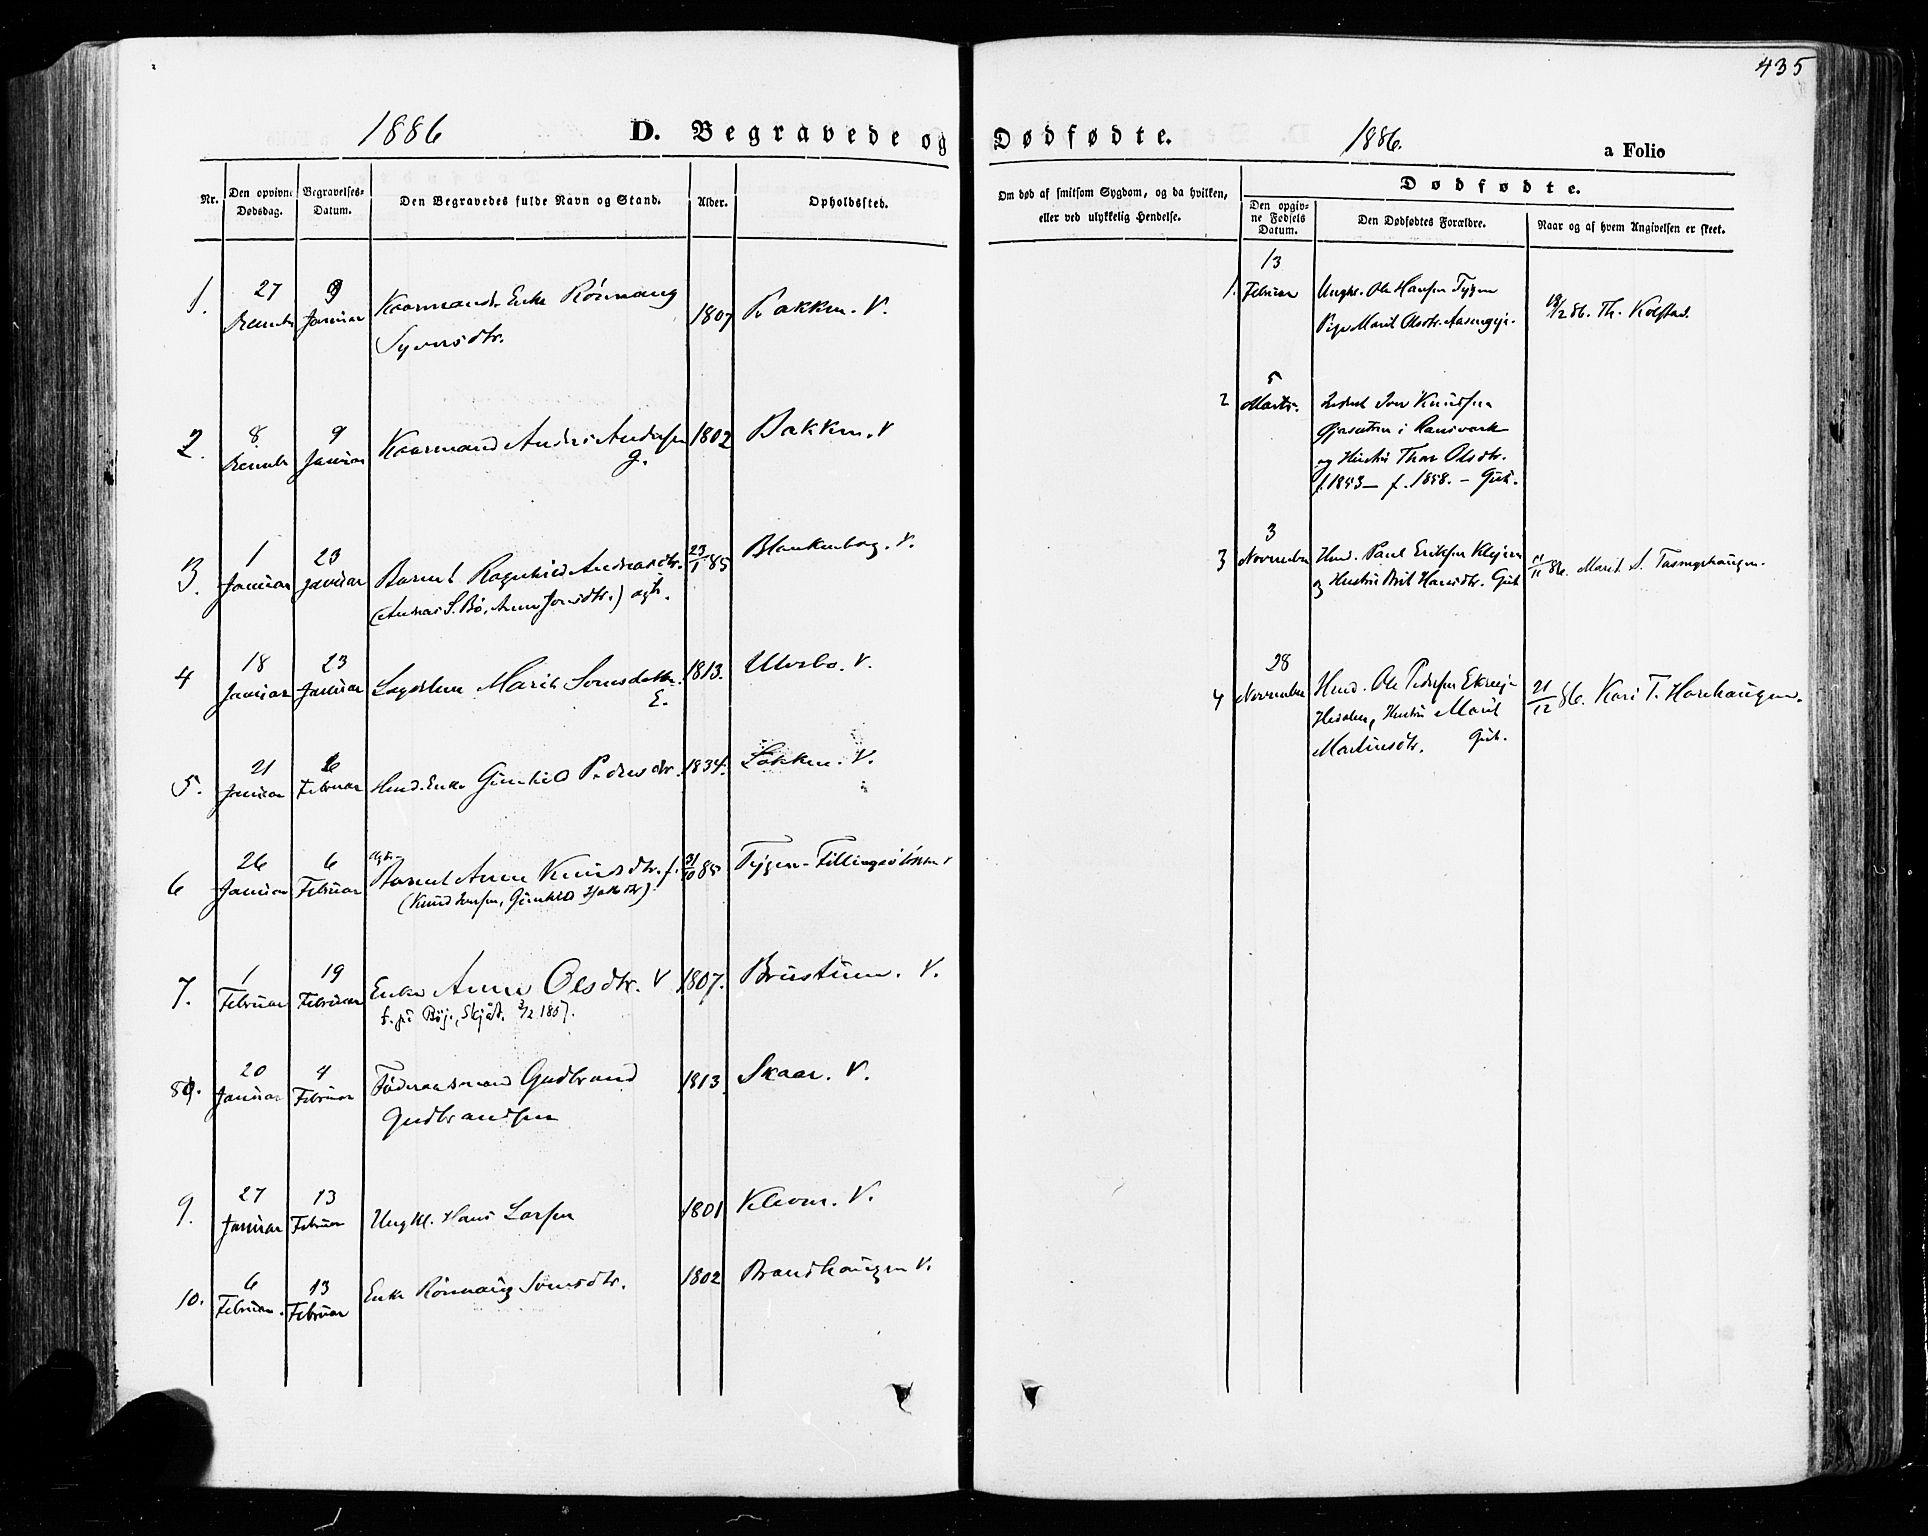 SAH, Vågå prestekontor, Ministerialbok nr. 7 /1, 1872-1886, s. 435